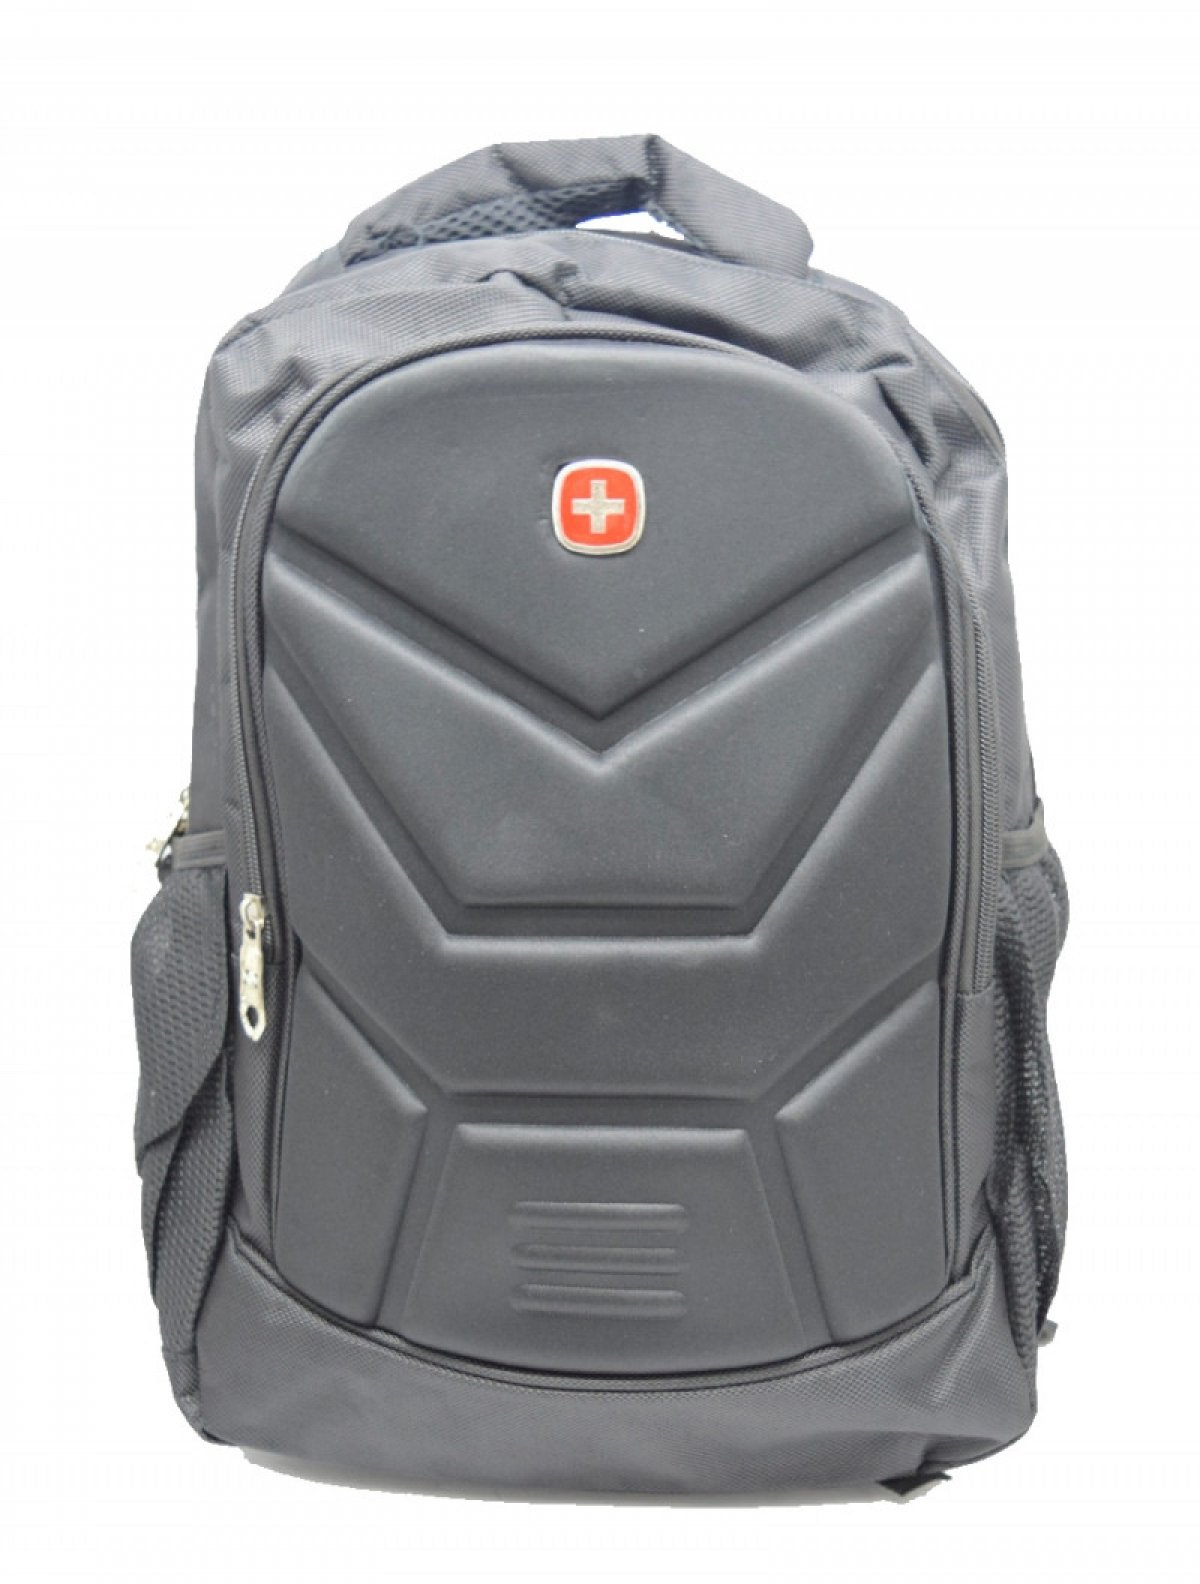 Swiiissgearr 8817-1 рюкзак черный текстиль